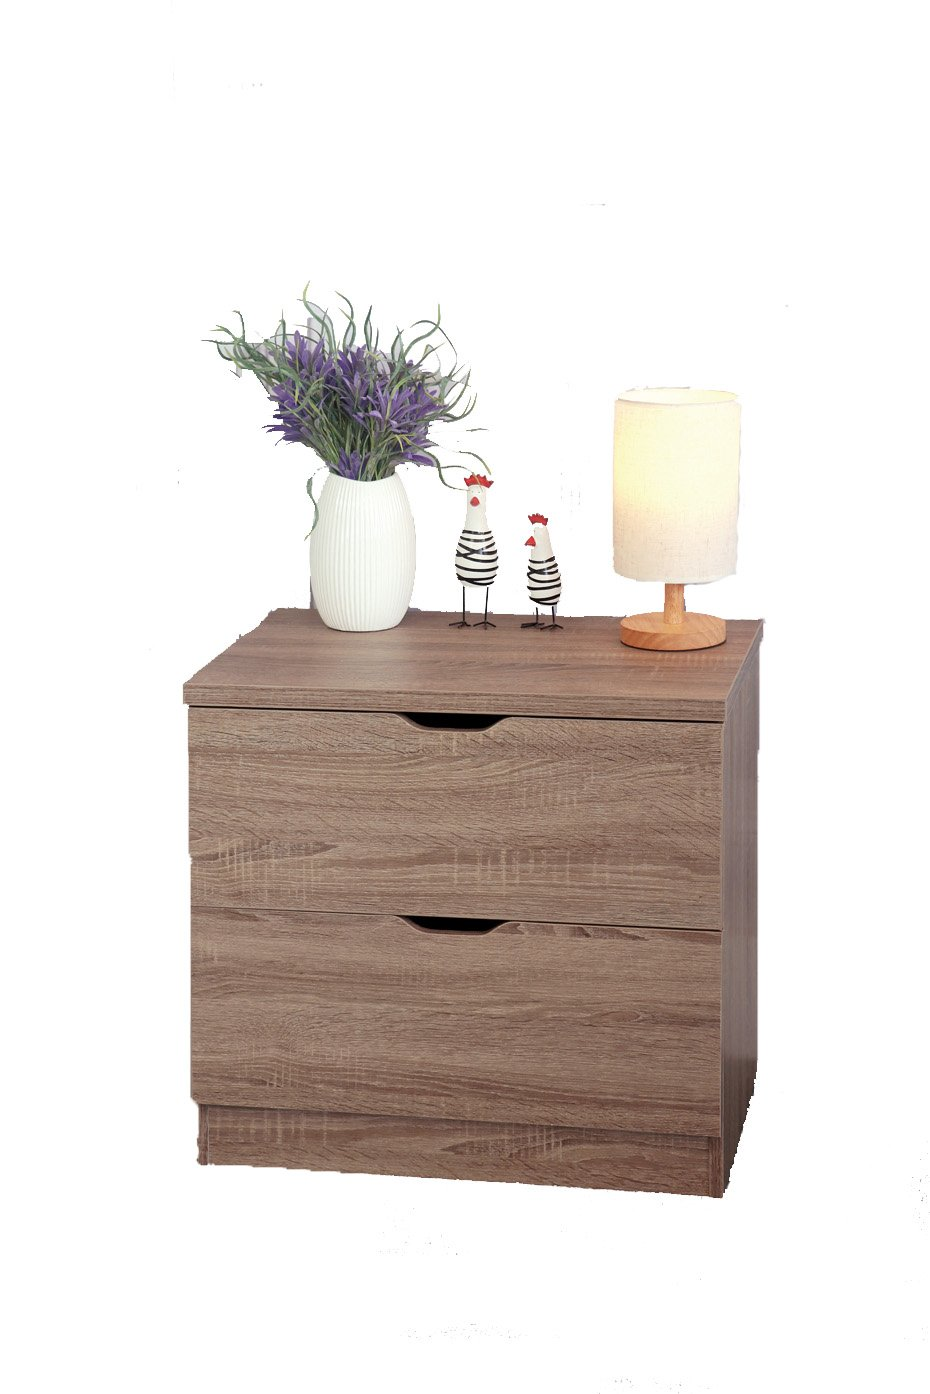 Smart home Eltra K Series 2 Drawers Chest Dresser (2 Drawers, Dark Taupe)